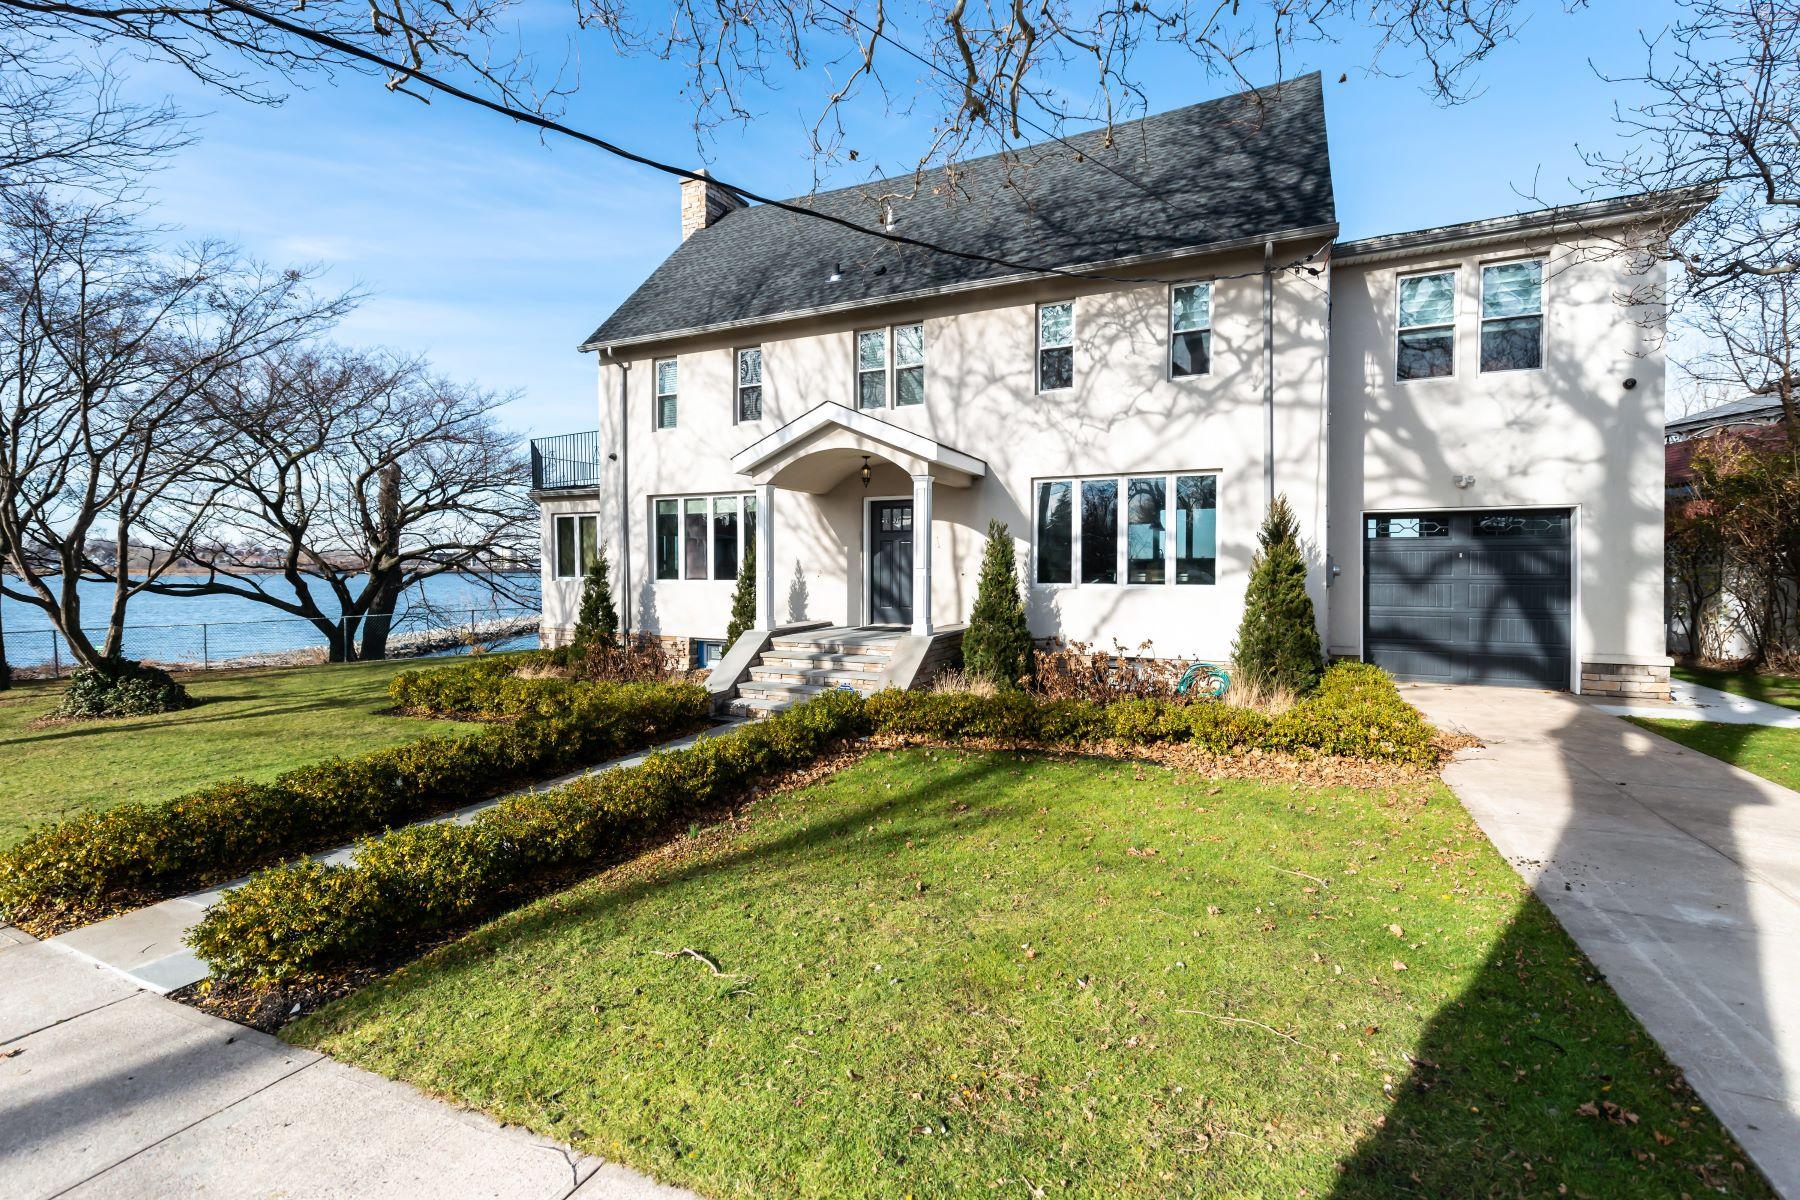 Single Family Homes for Sale at Malba 17 Boulevard Malba, New York 11357 United States